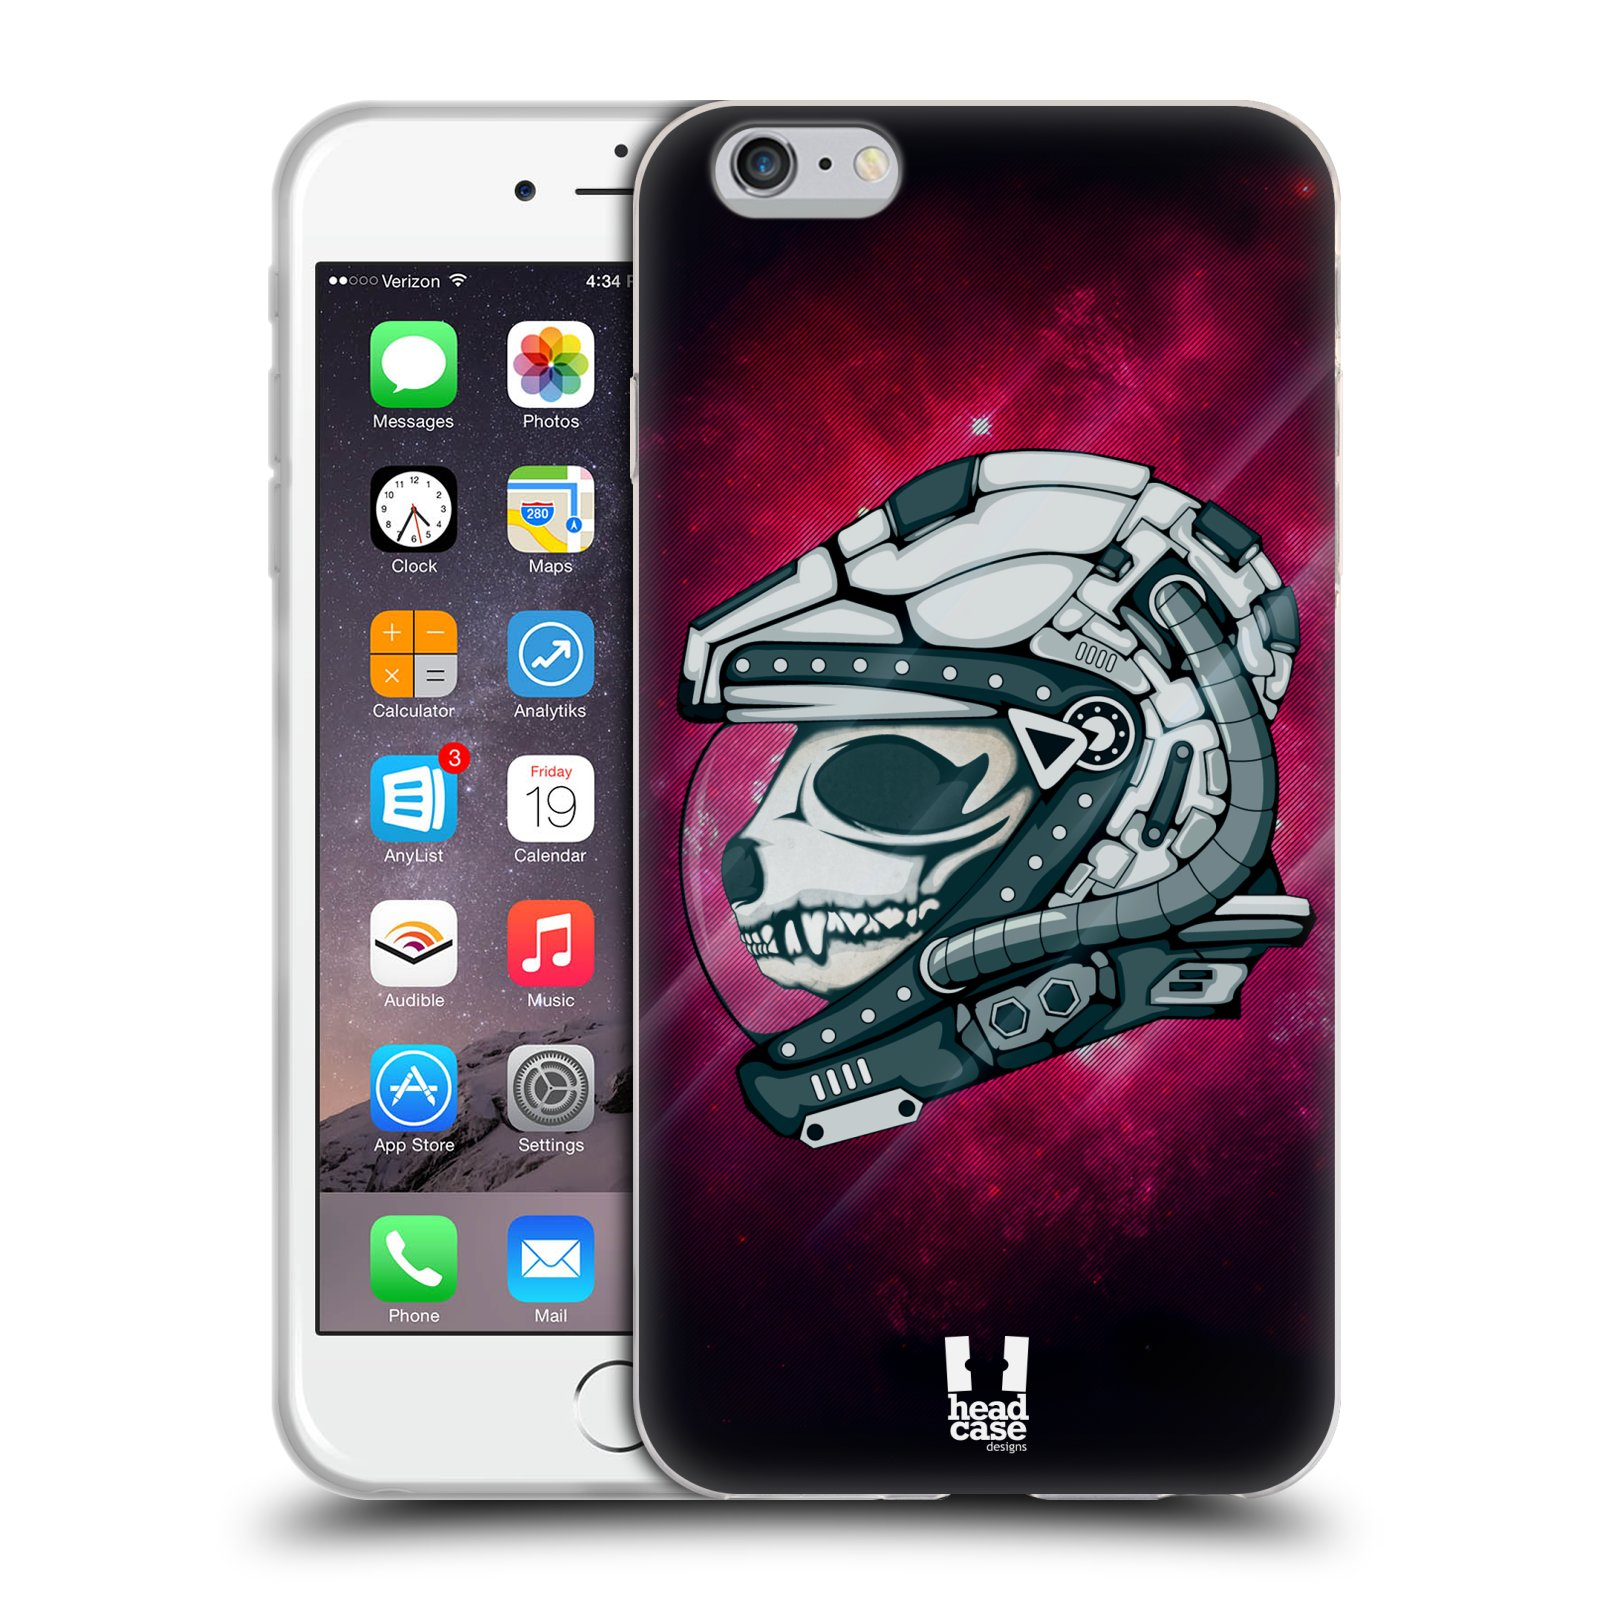 HEAD CASE silikonový obal na mobil Apple Iphone 6 PLUS/ 6S PLUS vzor zvířecí lebka astronaut panda